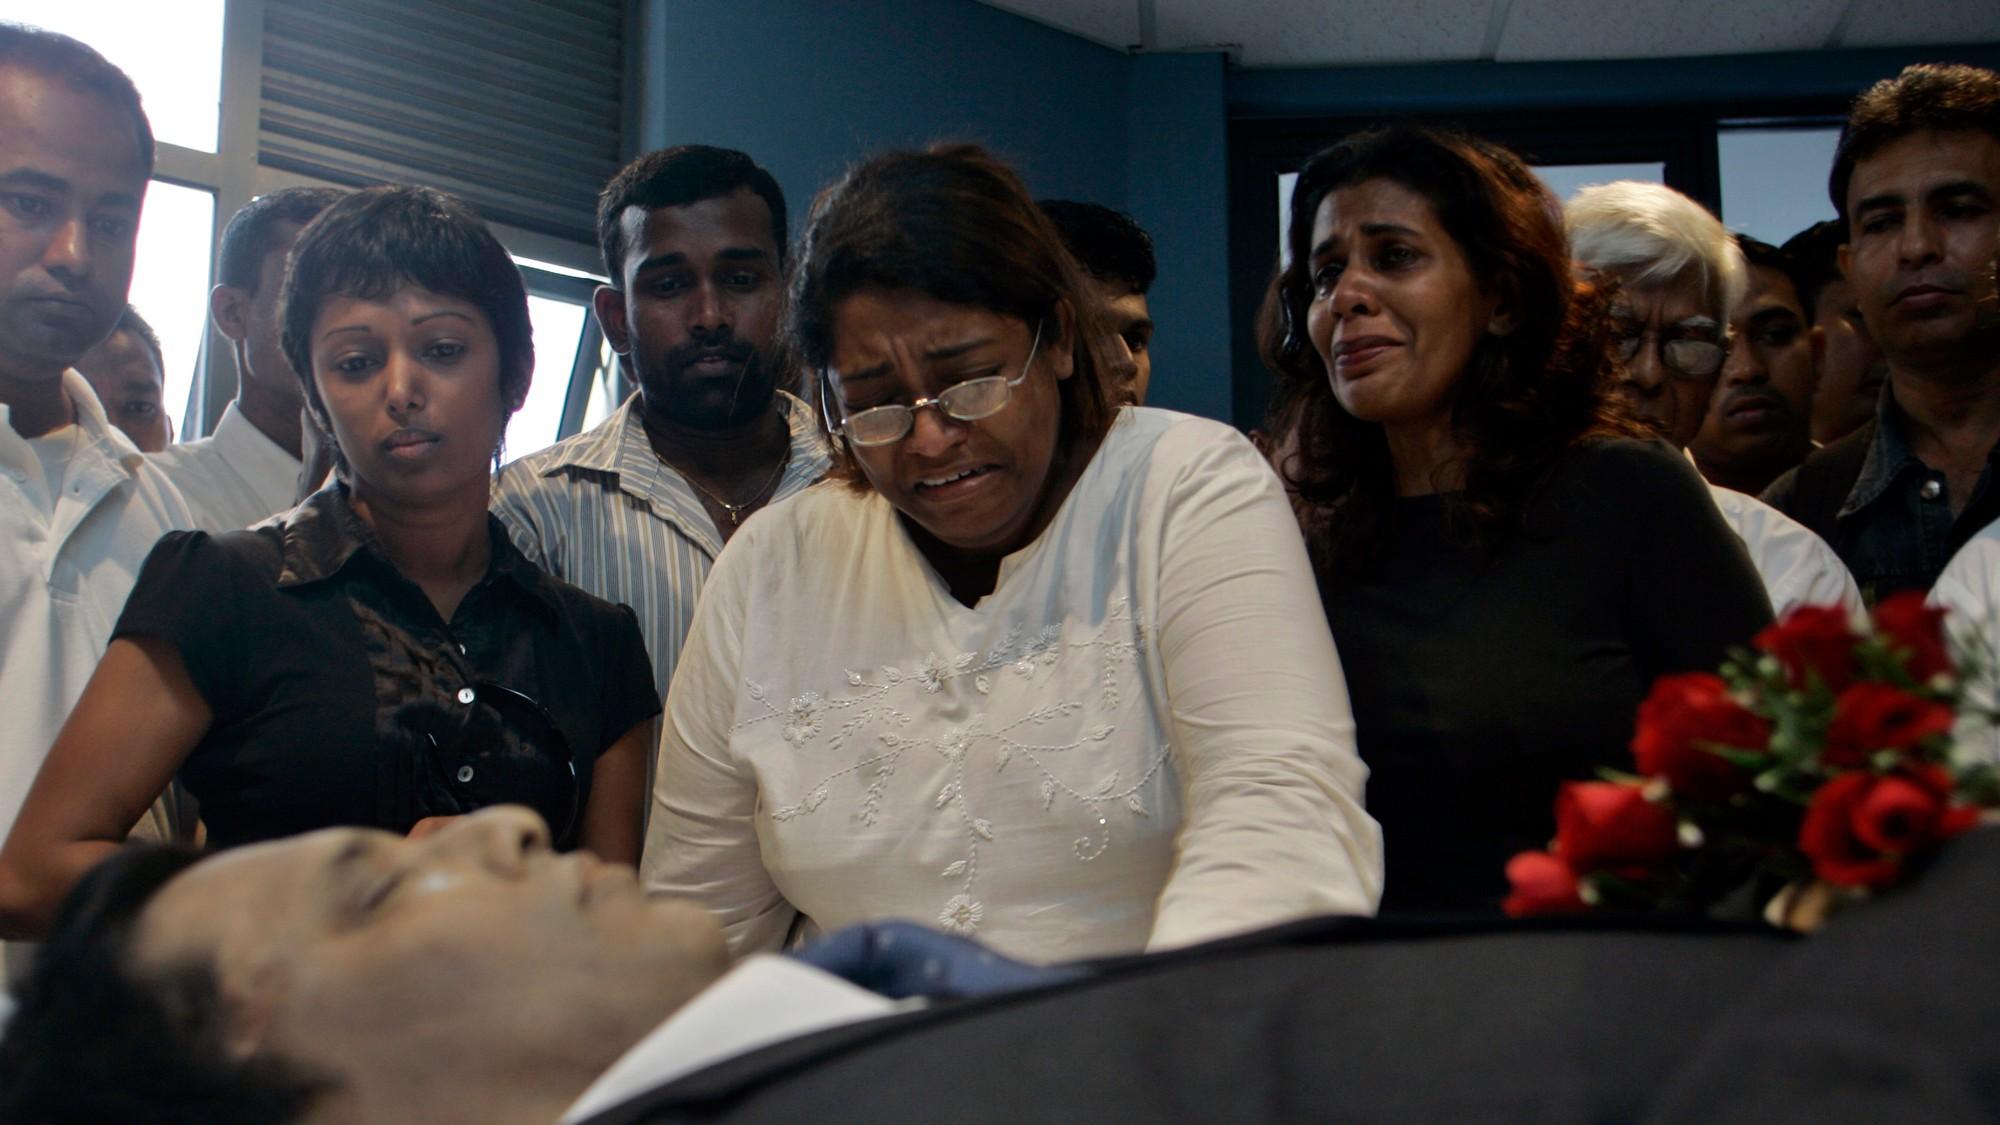 lasantha wickramatunga essay Last thursday, lasantha wickramatunga, who was fifty-two years old and the editor of a sri lankan newspaper called the sunday leader, was assassinated on.